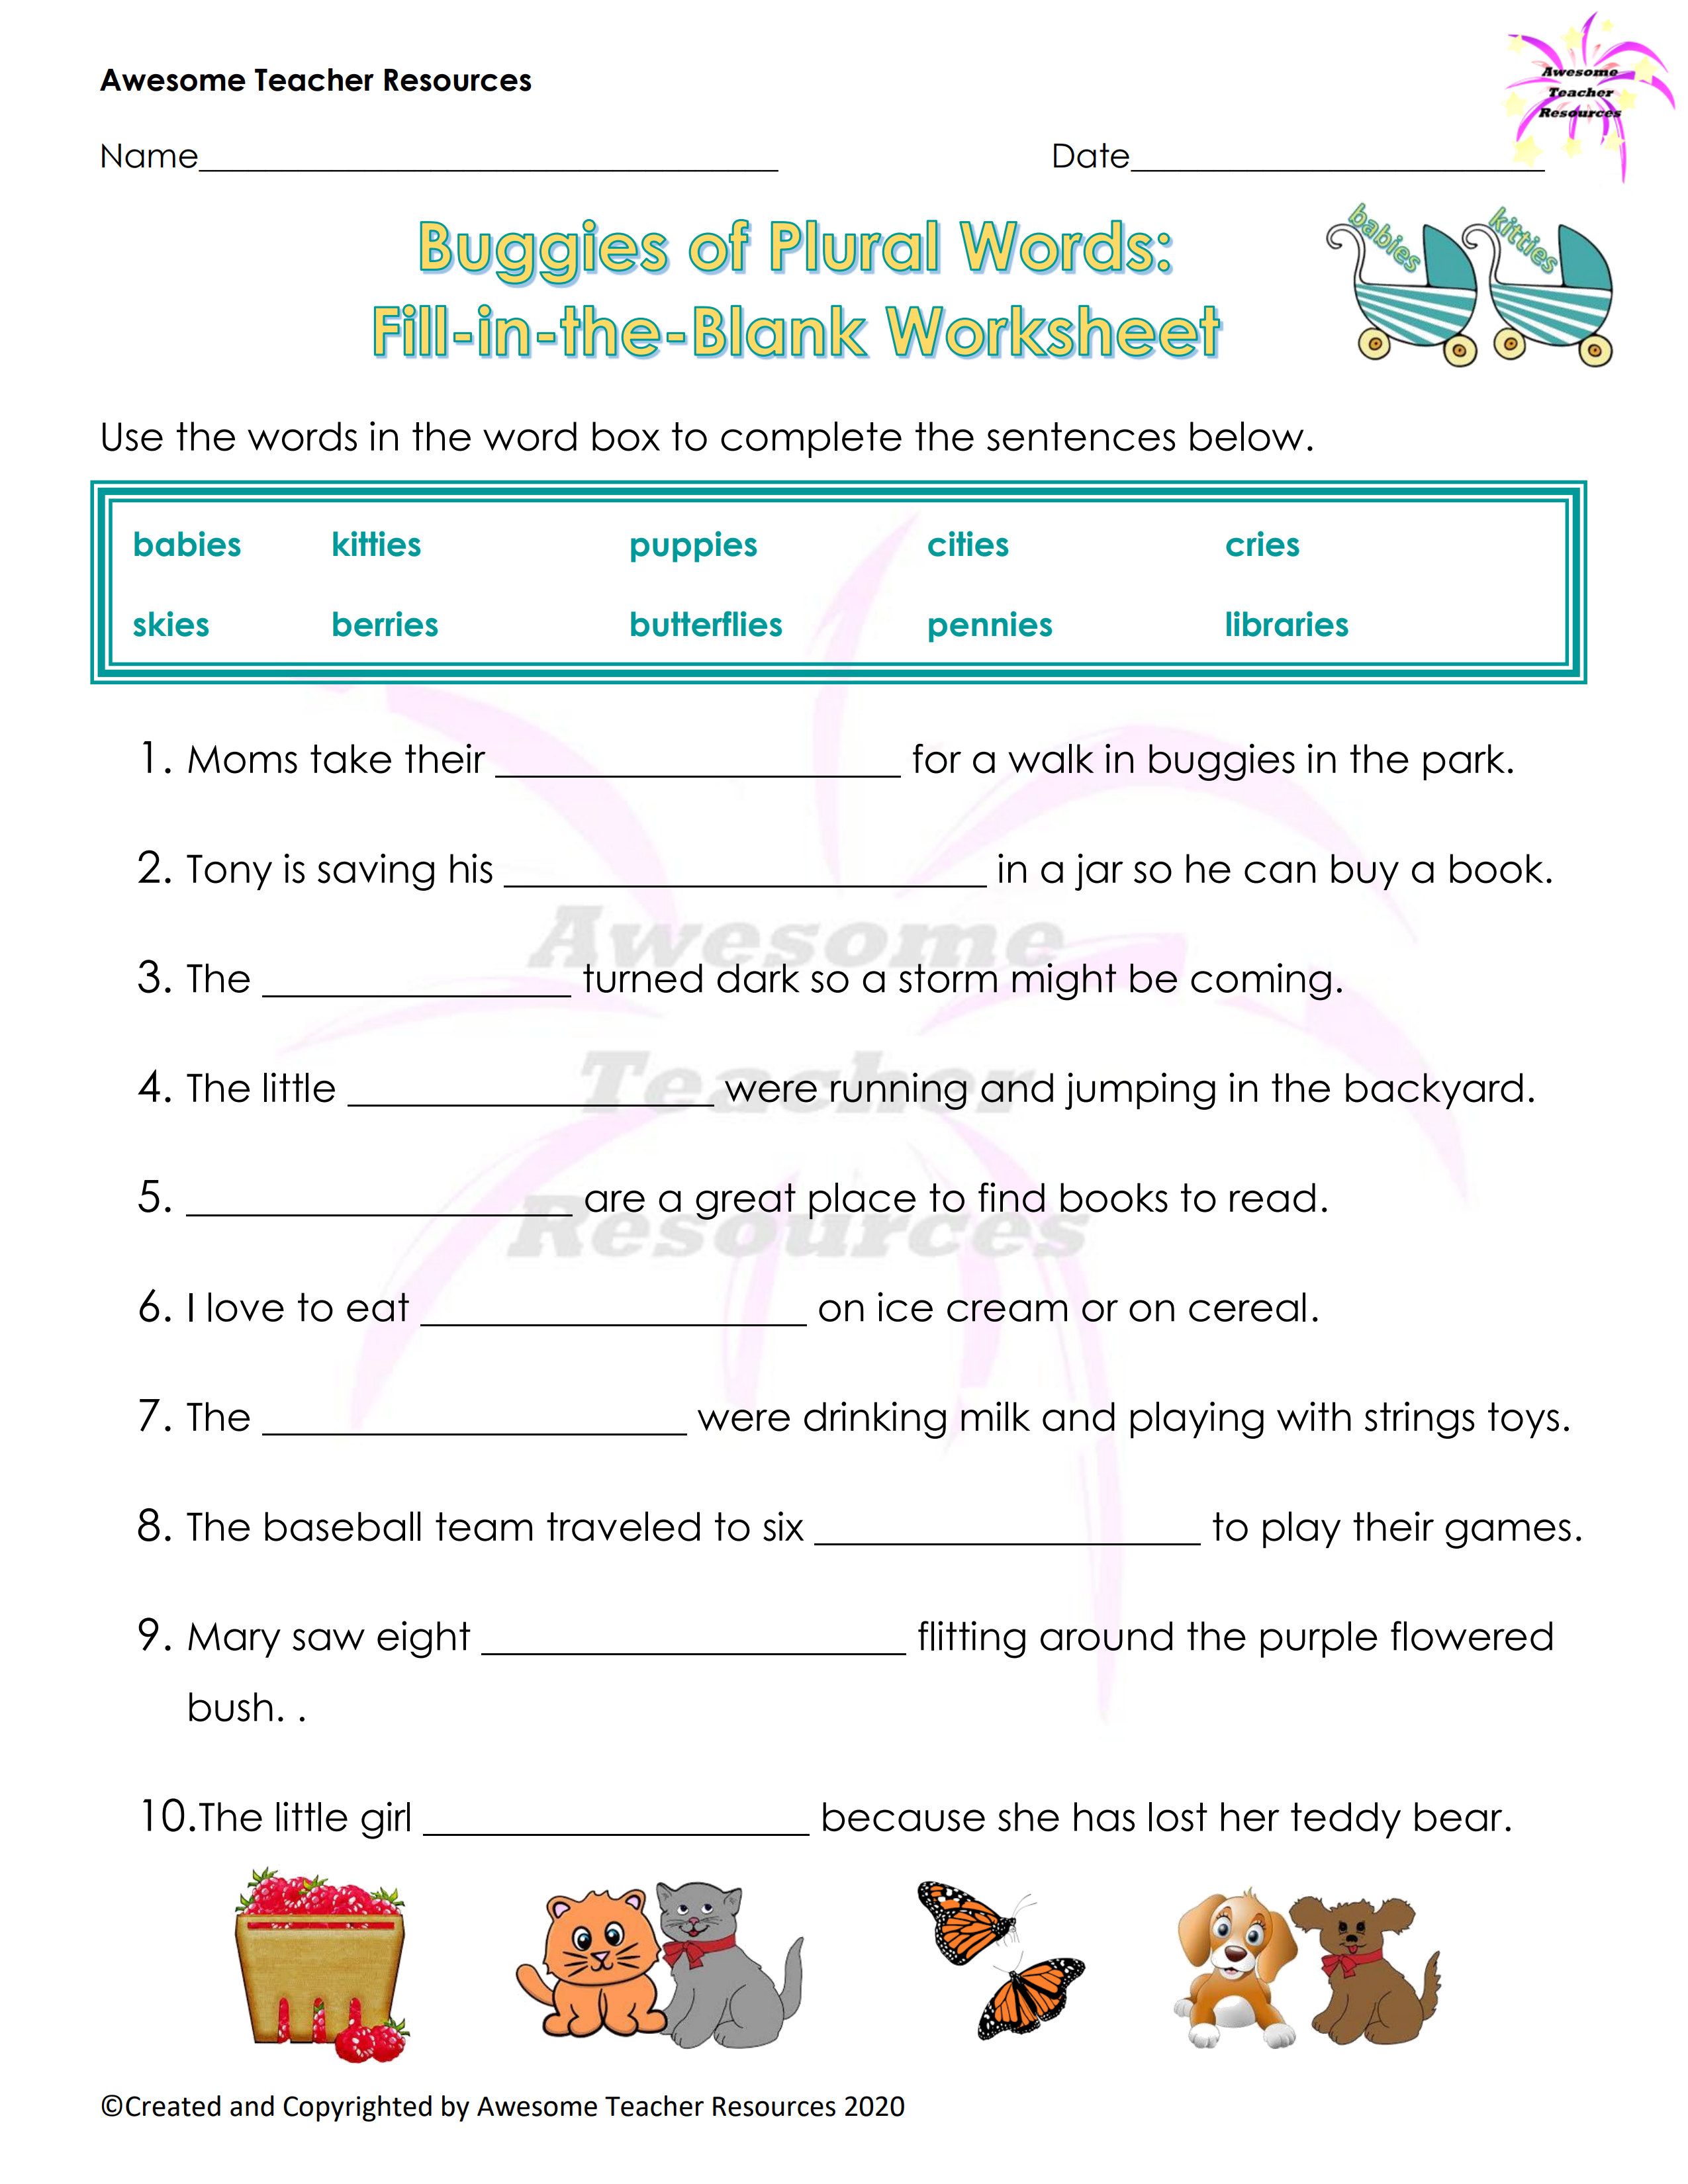 Buggies Of Plural Words Fill In The Blank Worksheet In